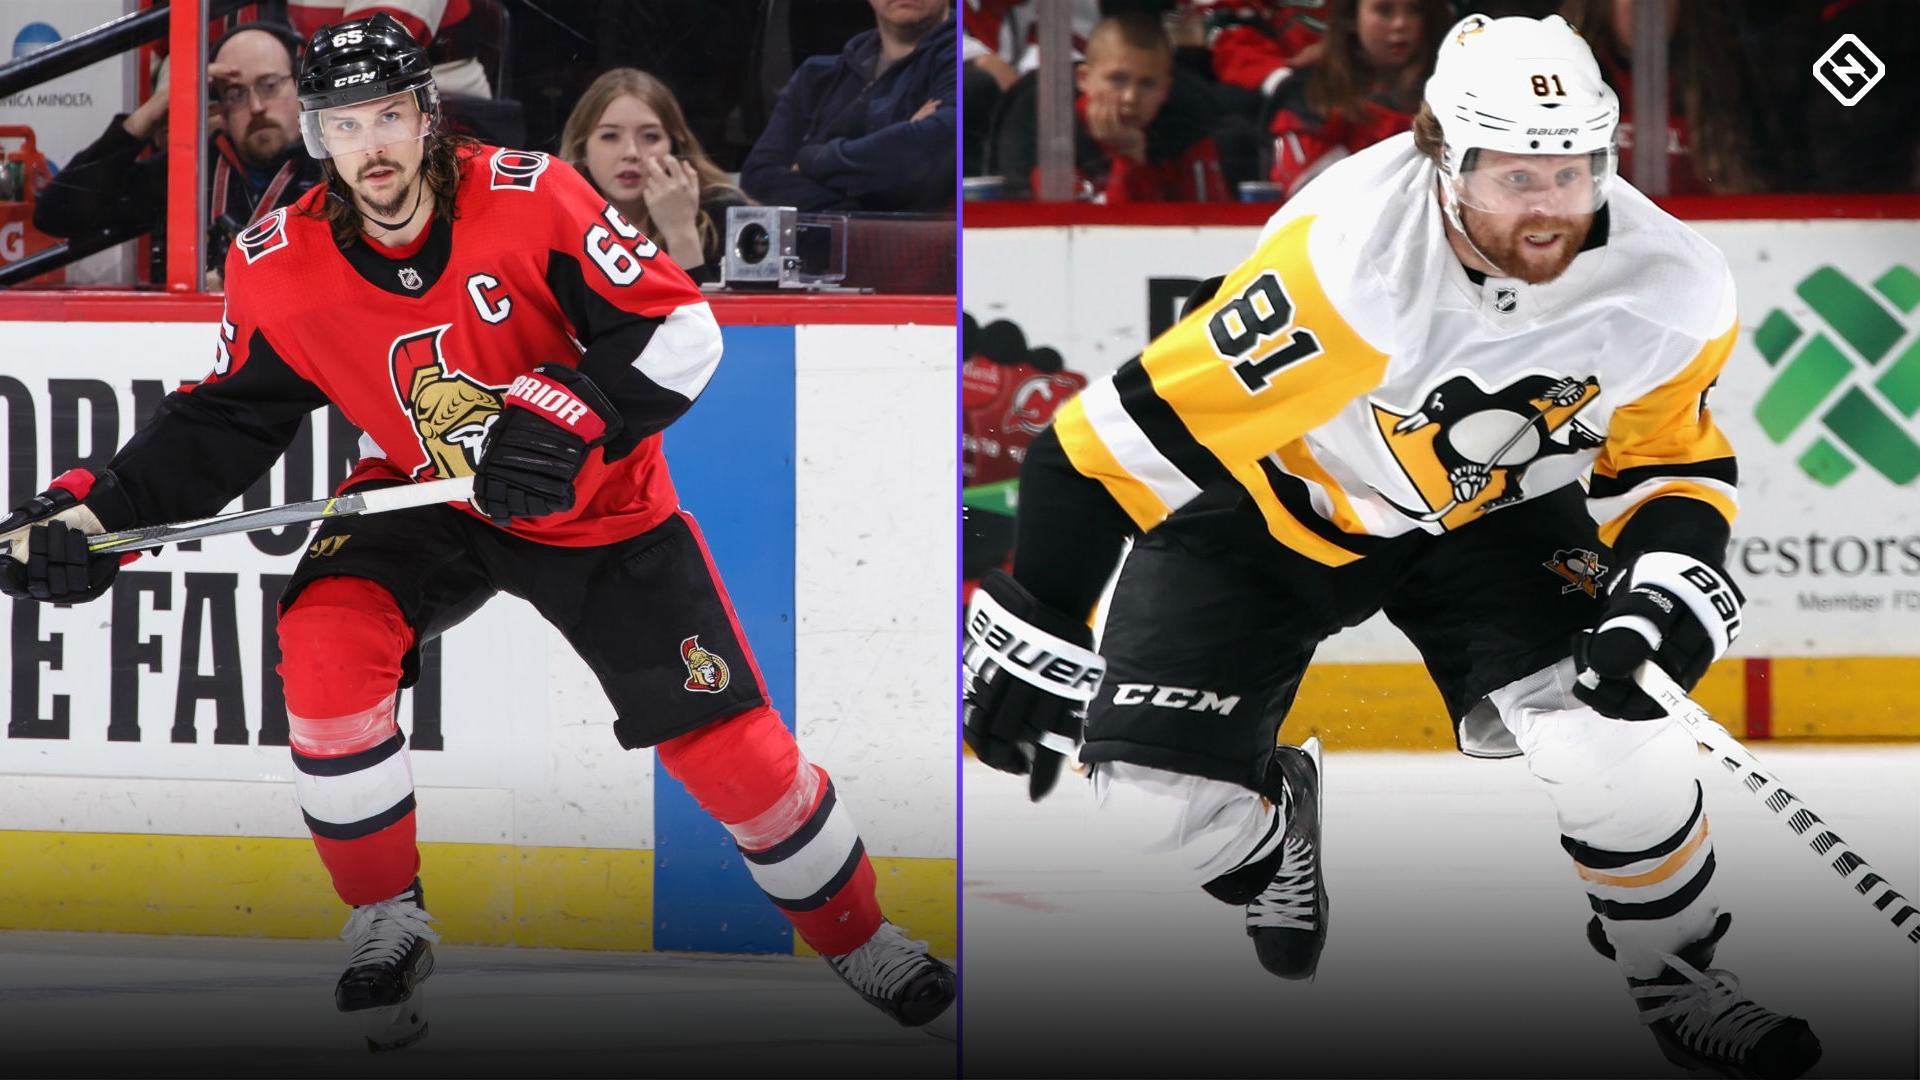 NHL trade rumors 2018: Erik Karlsson, Phil Kessel top list of